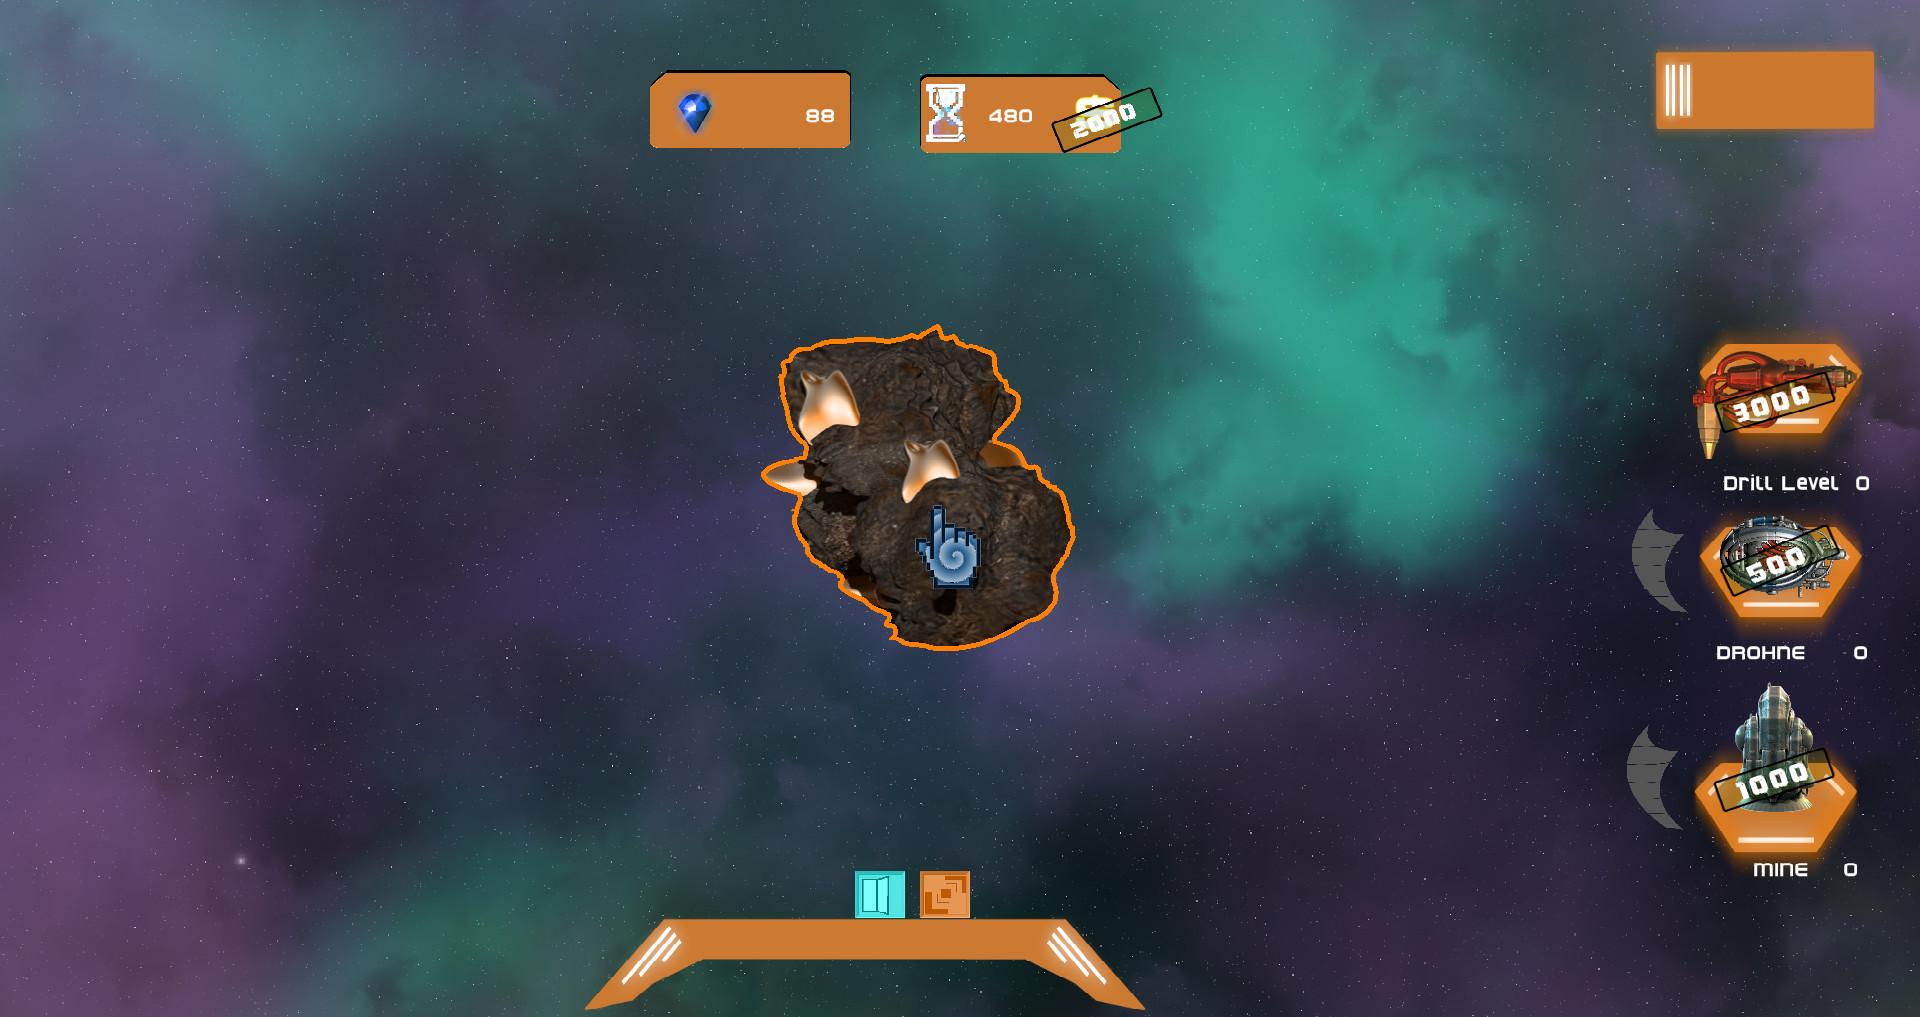 Click Space Miner screenshot